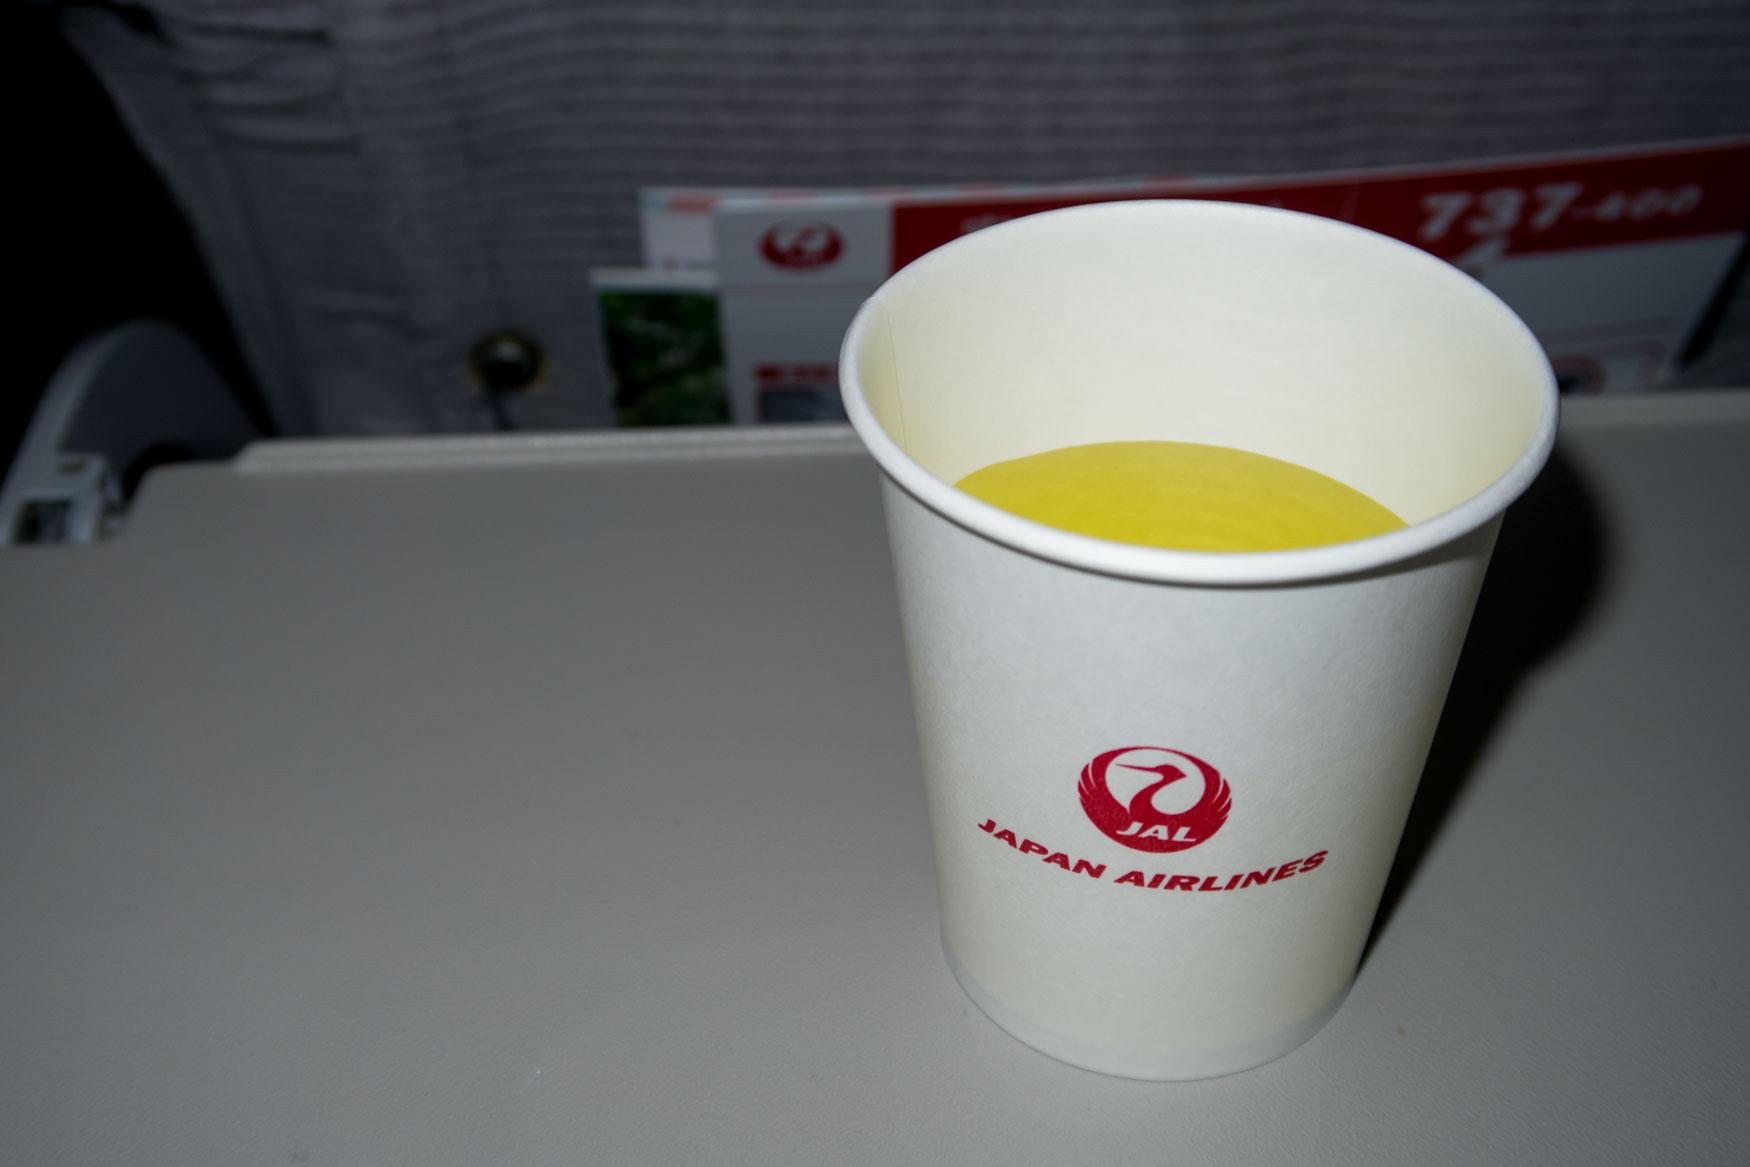 Japan Airlines Kiwi Juice